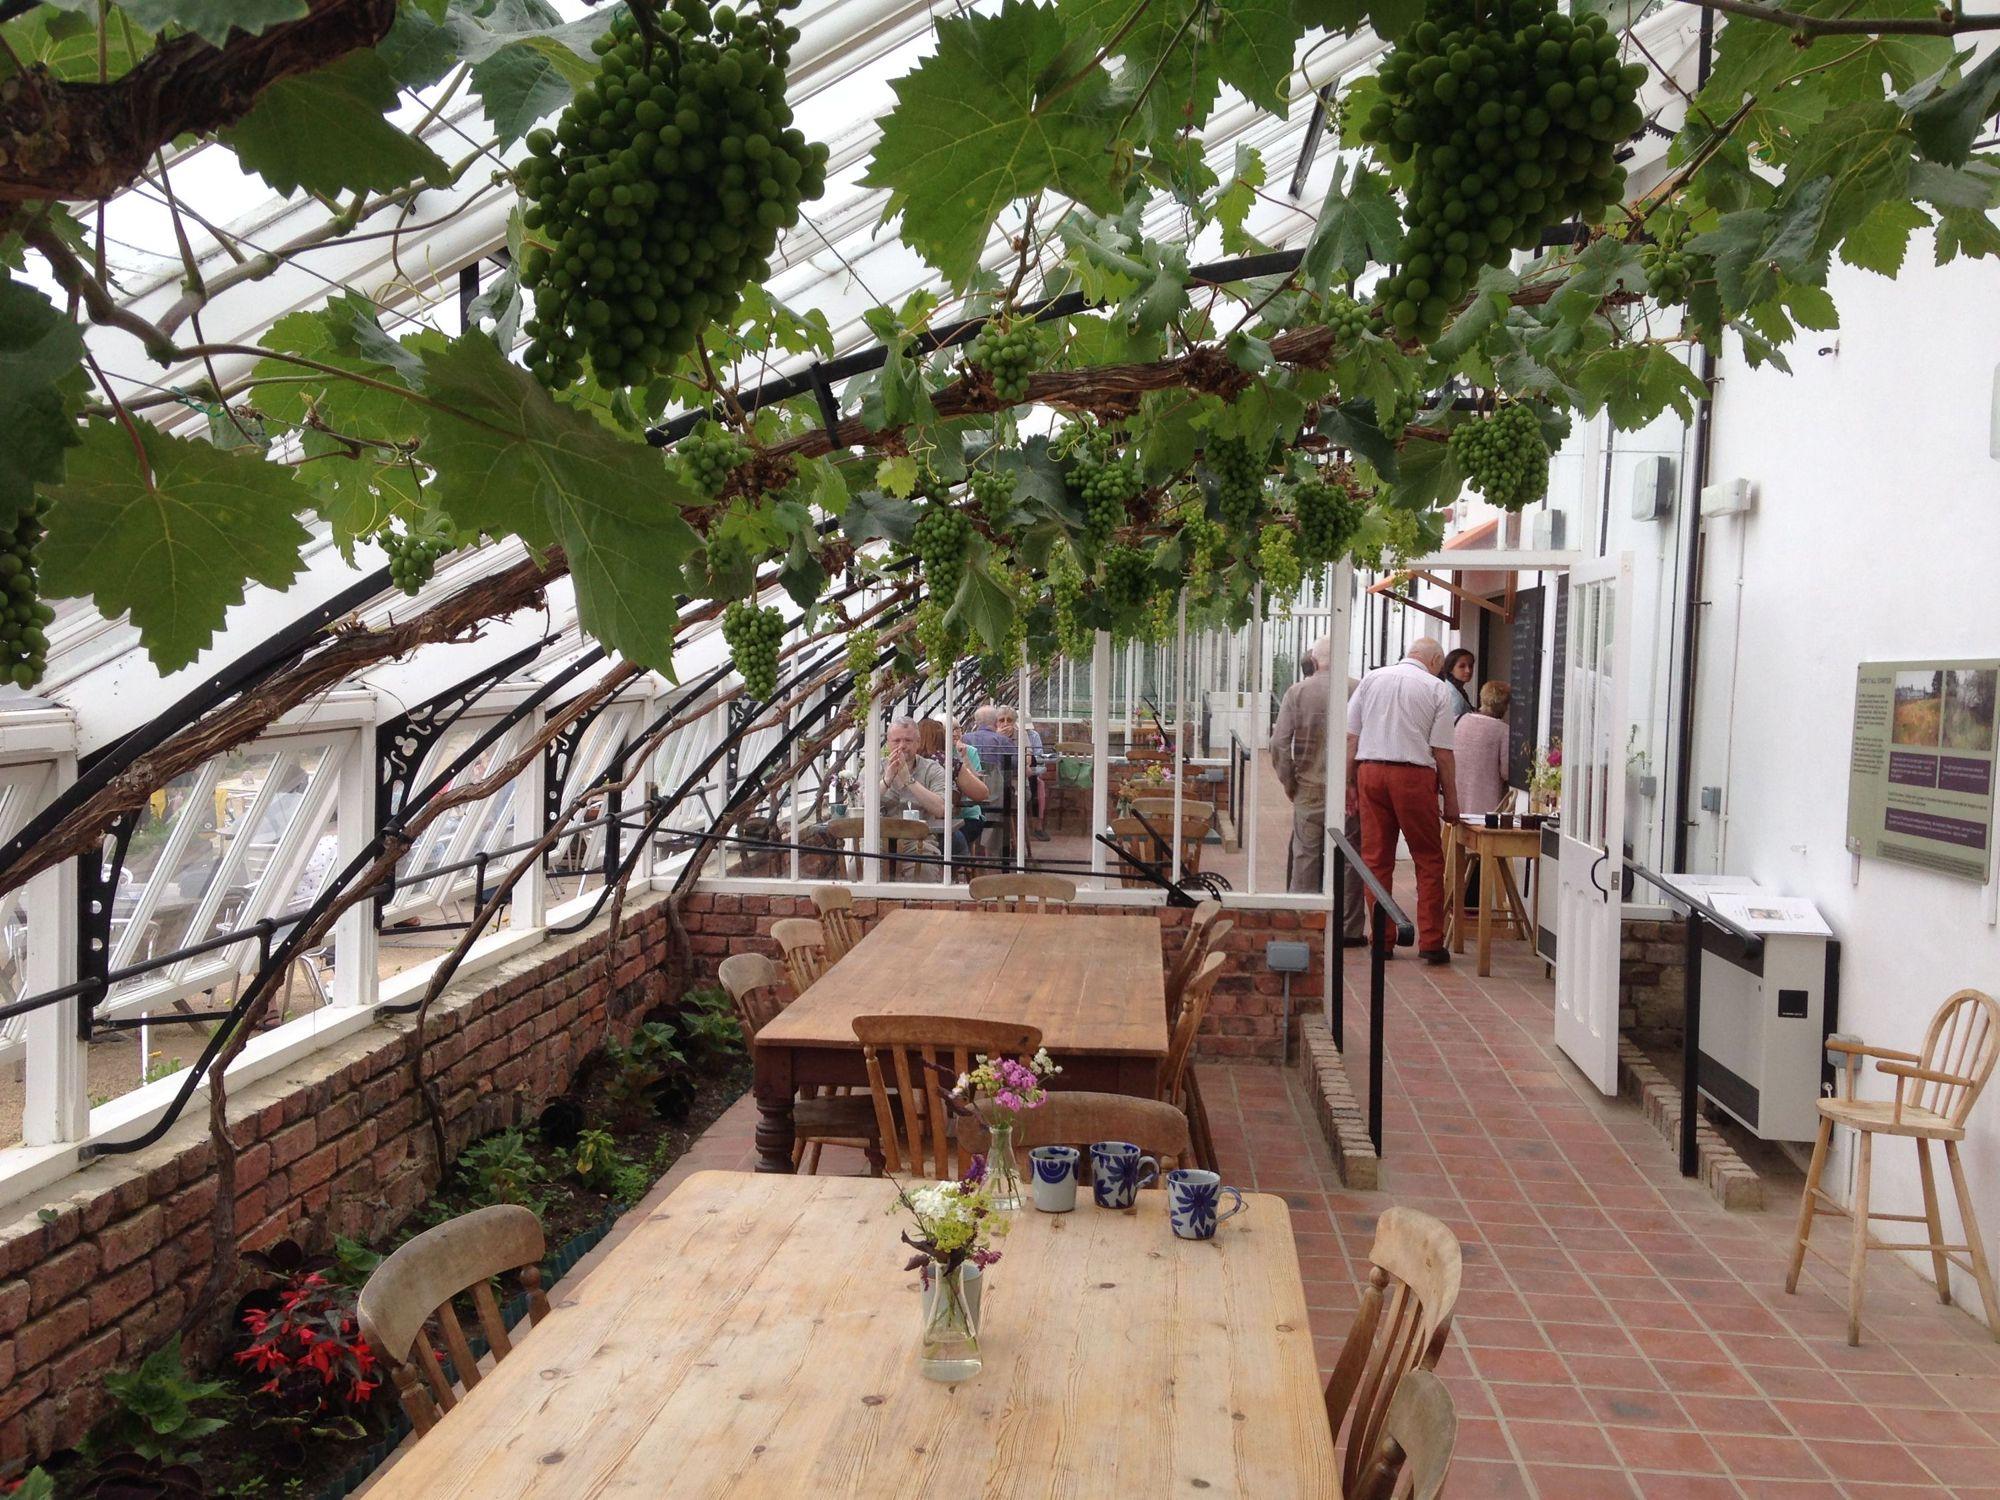 Vinehouse Café